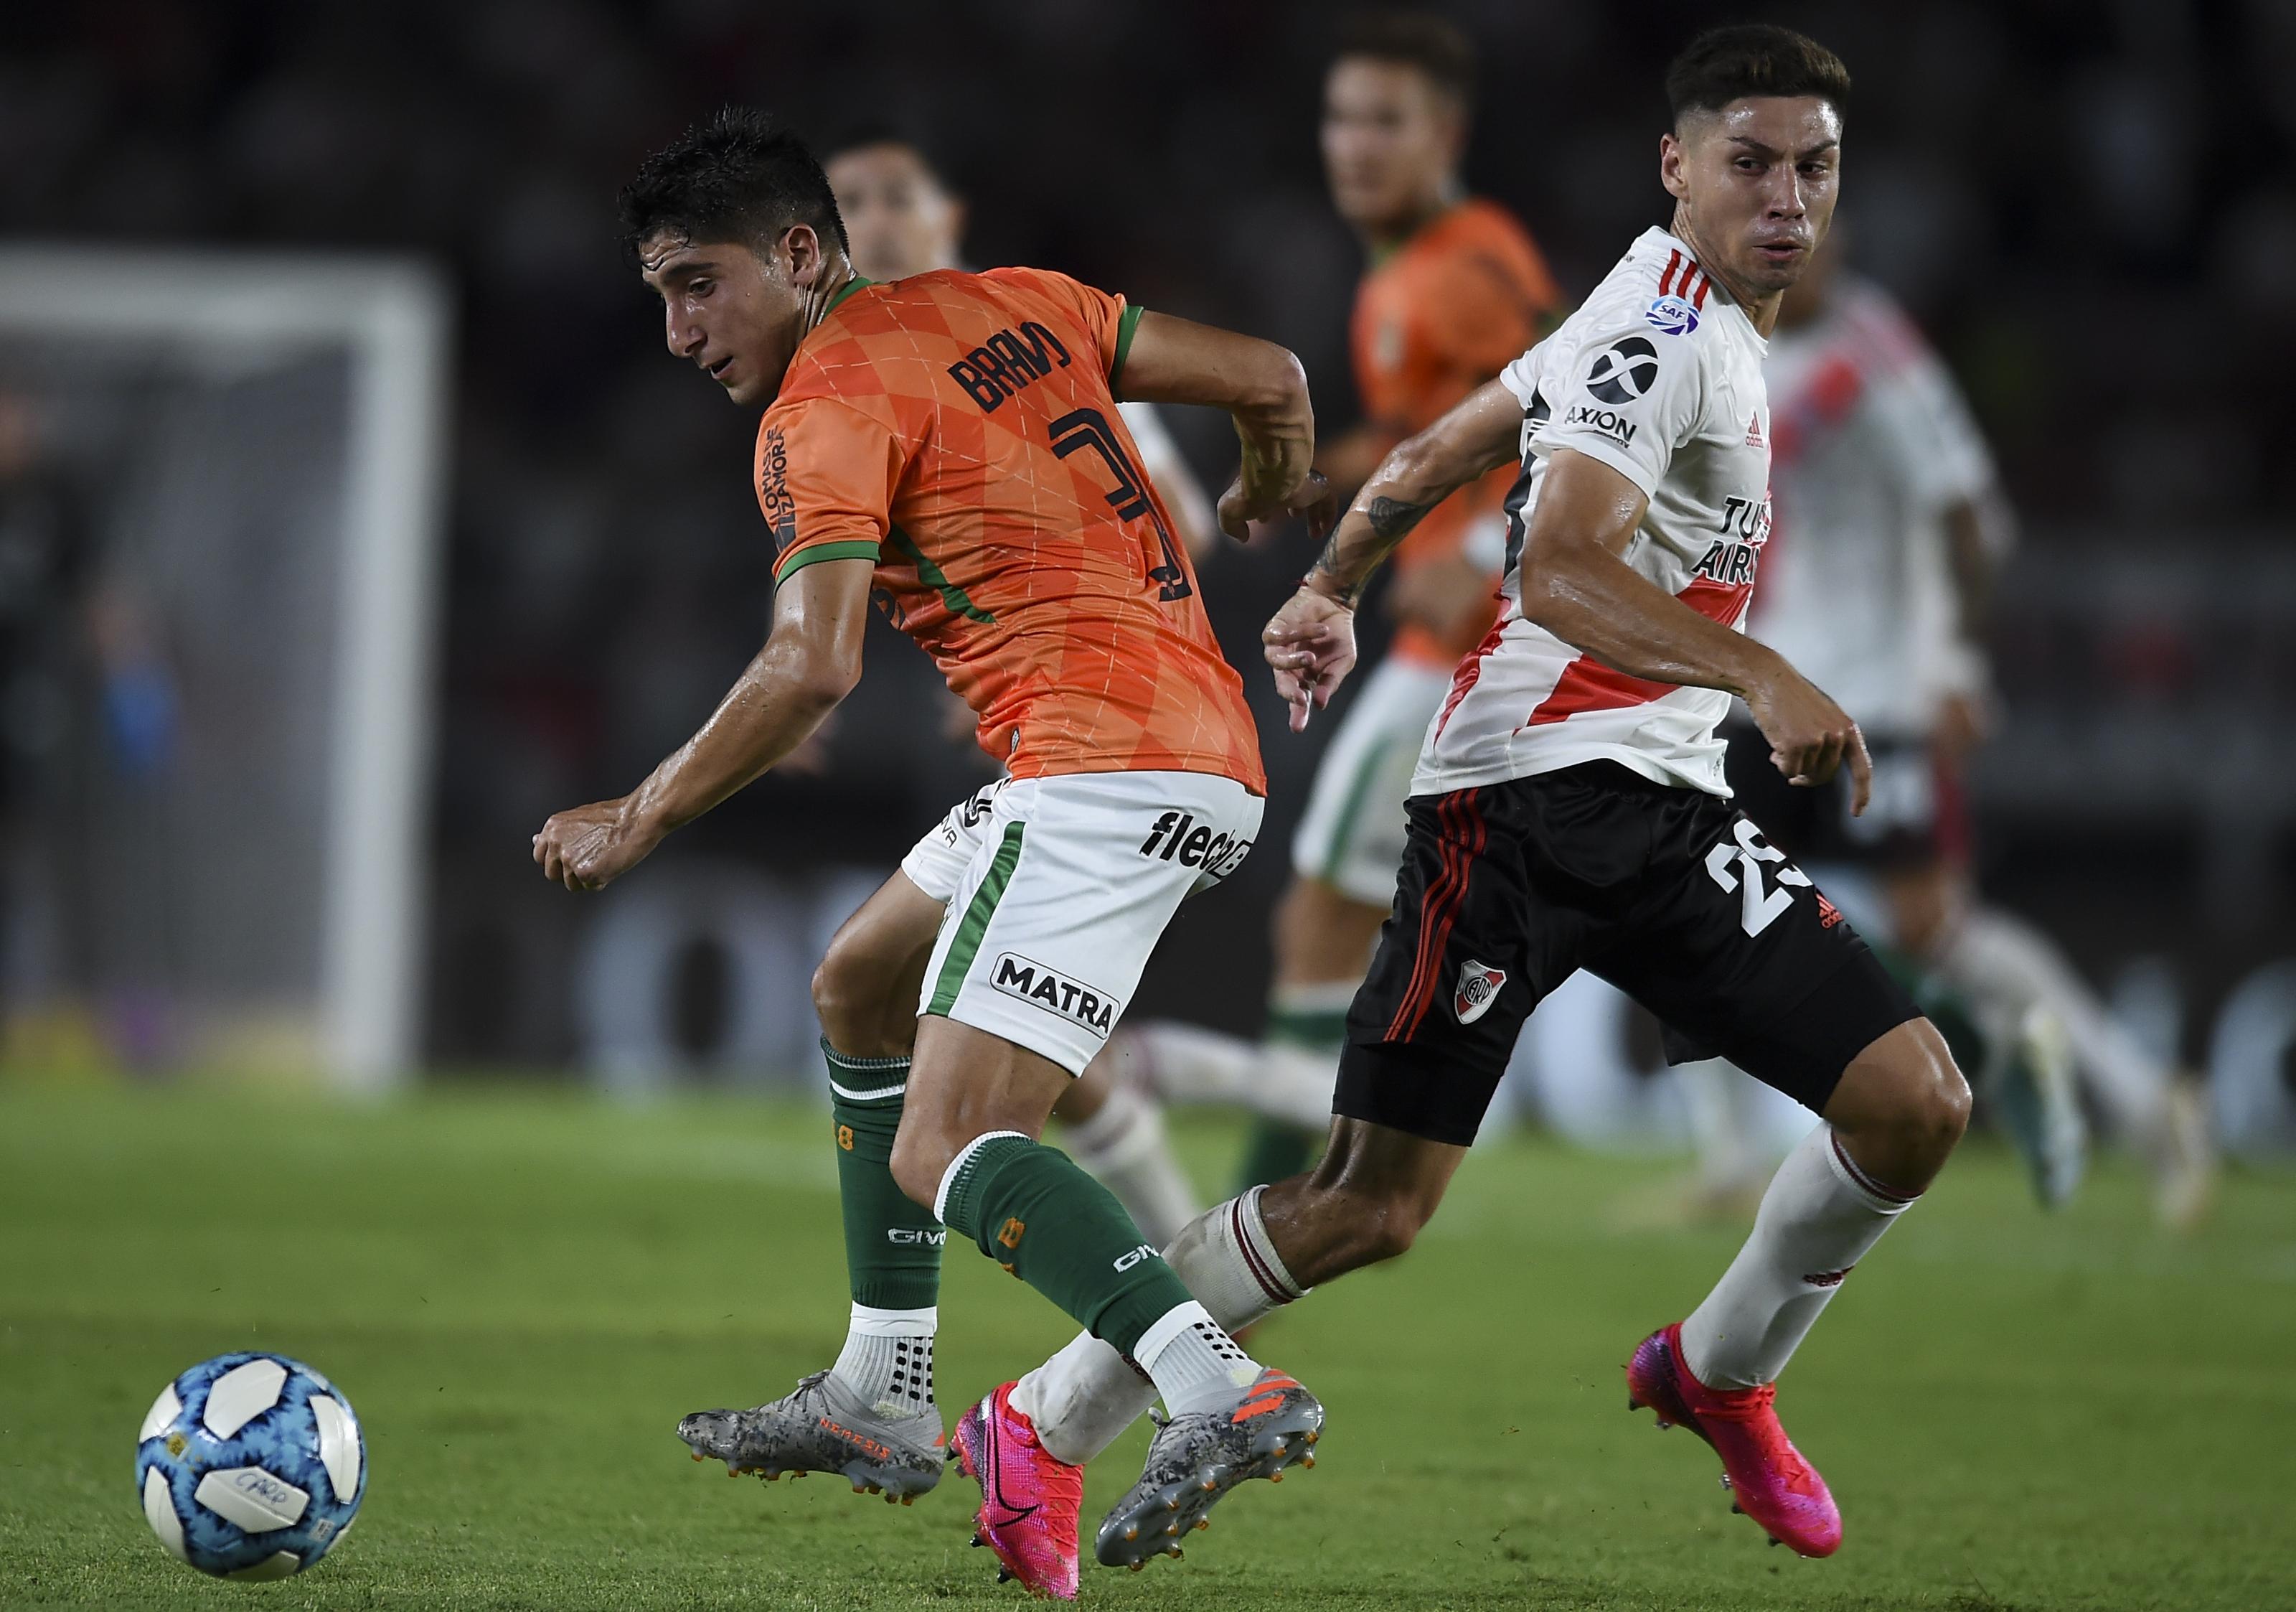 River Plate v Banfield - Superliga 2019/20